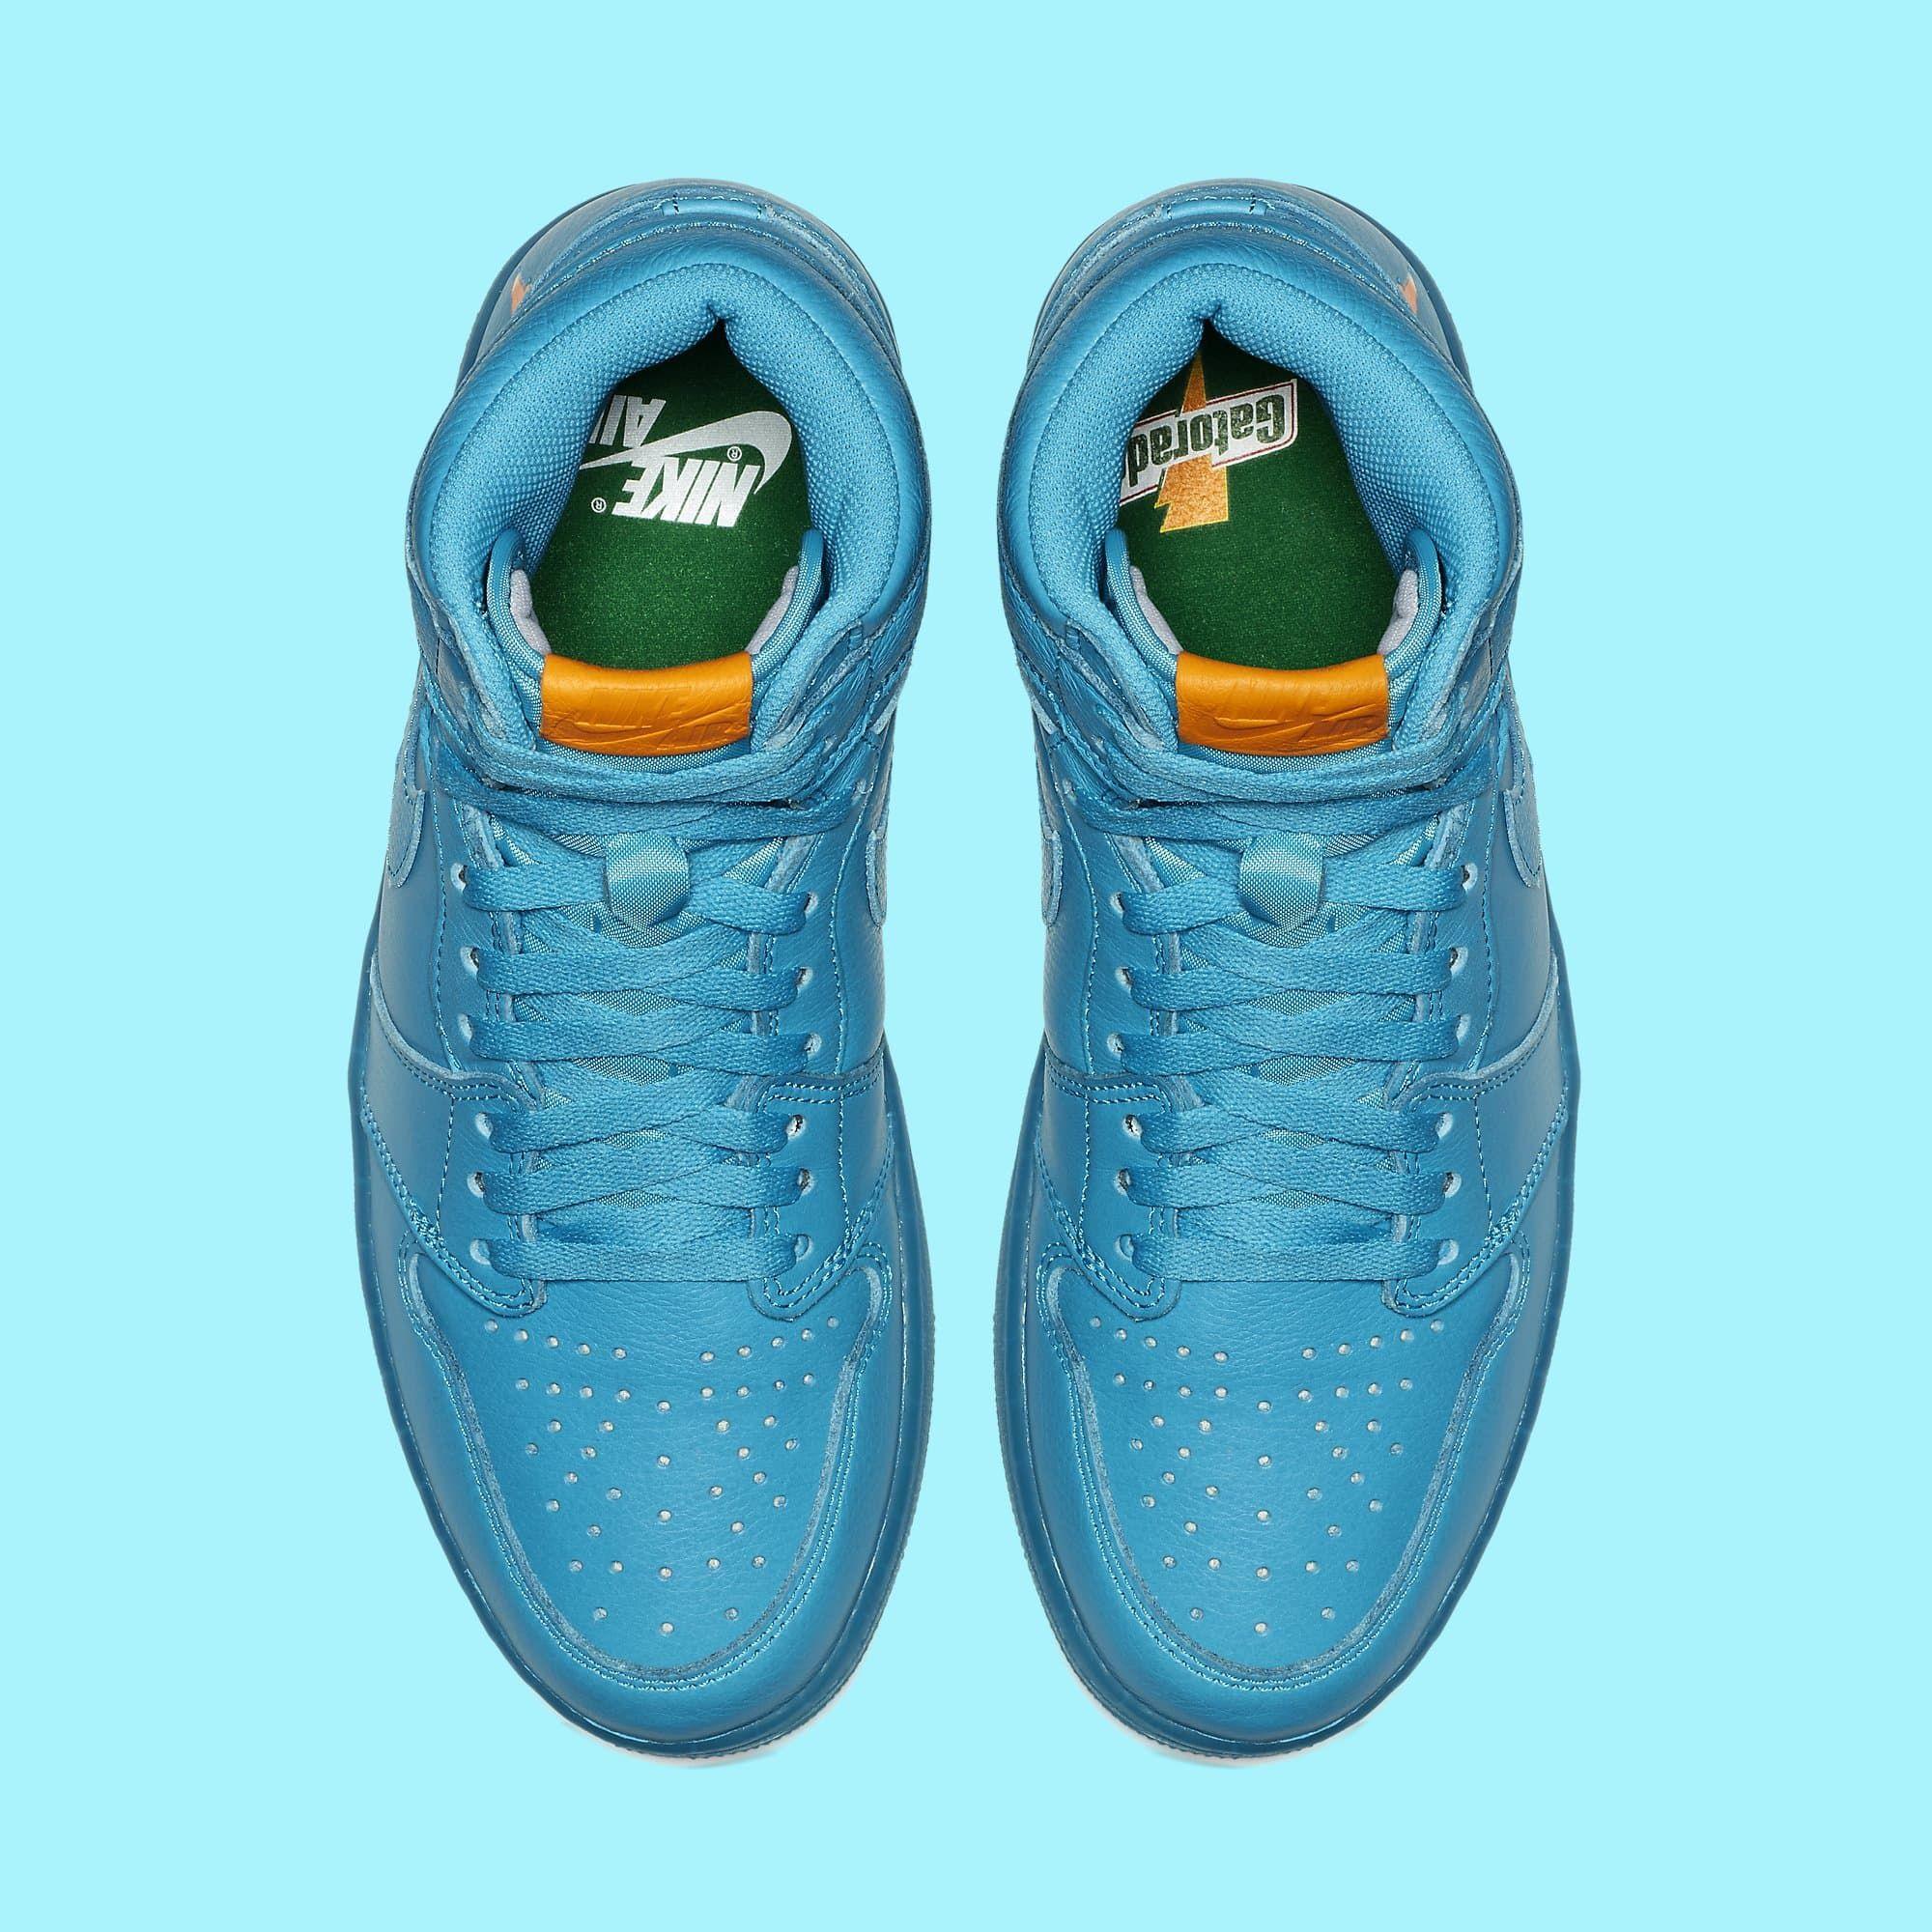 gatorade jordan 1 shoes